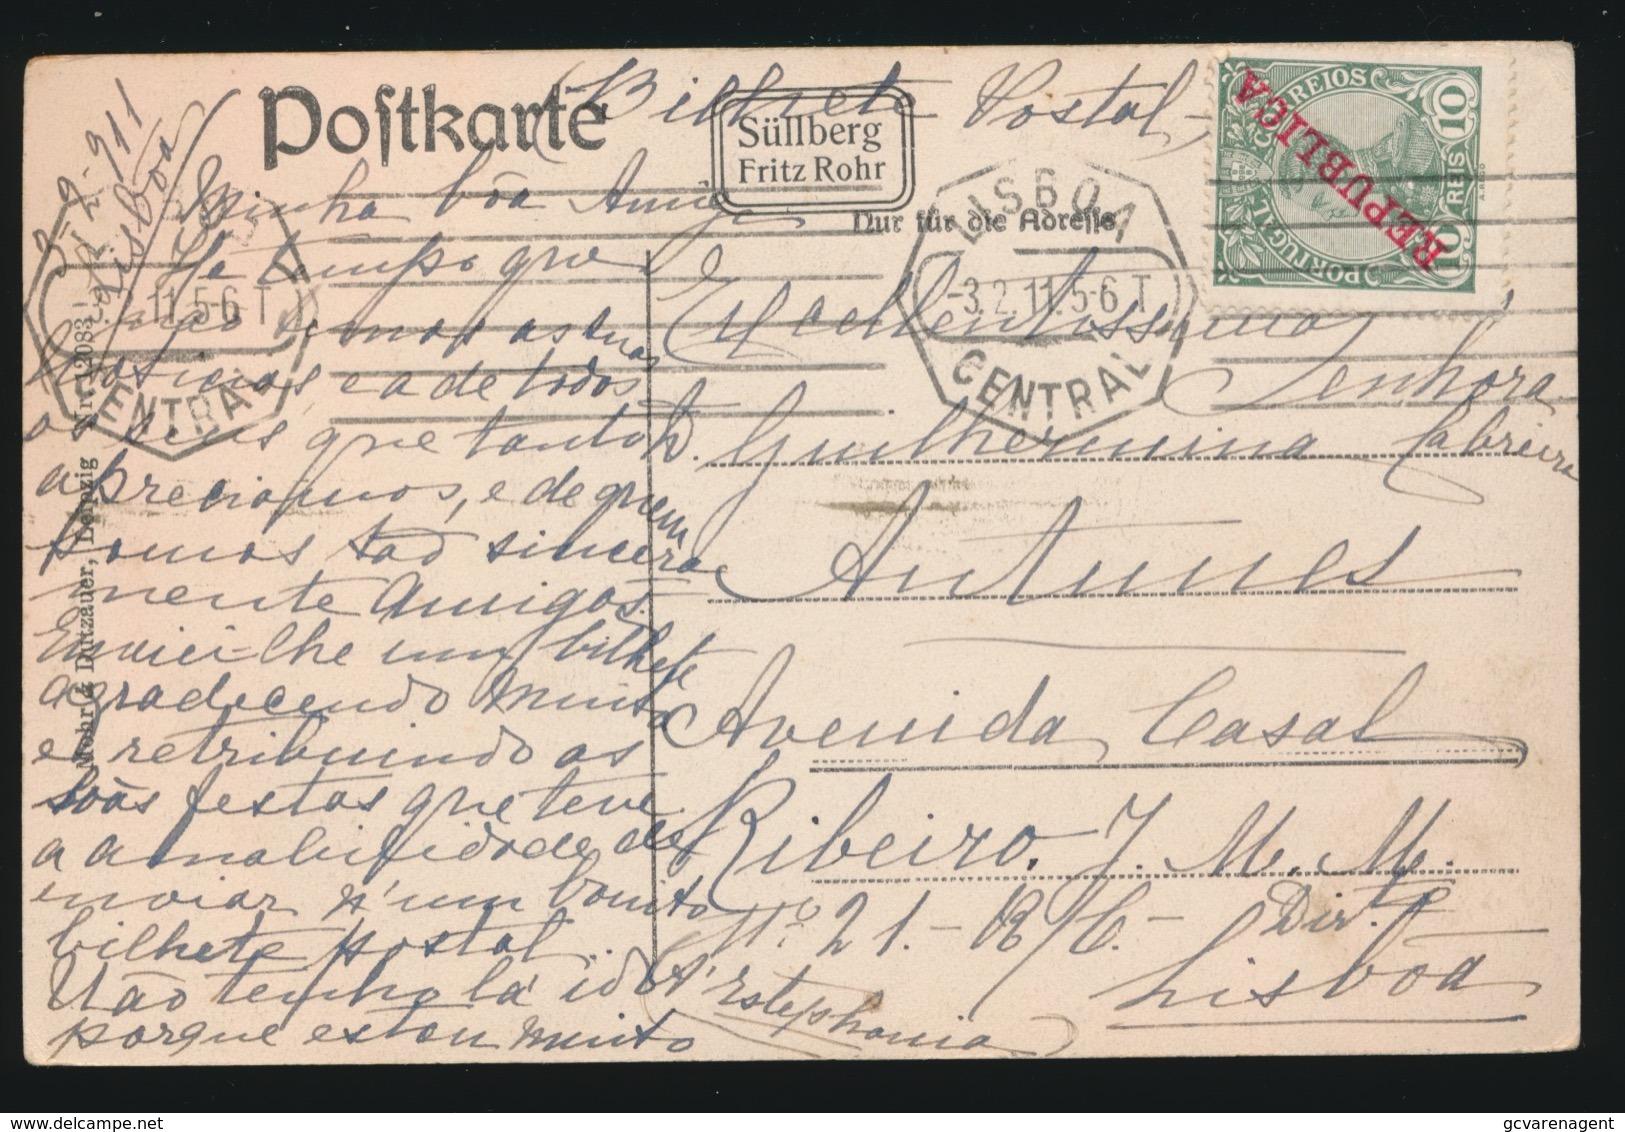 PORTUGAL   POSTCARD   10 REIS  REPUBLICA  - BLANKENESE - Lettres & Documents